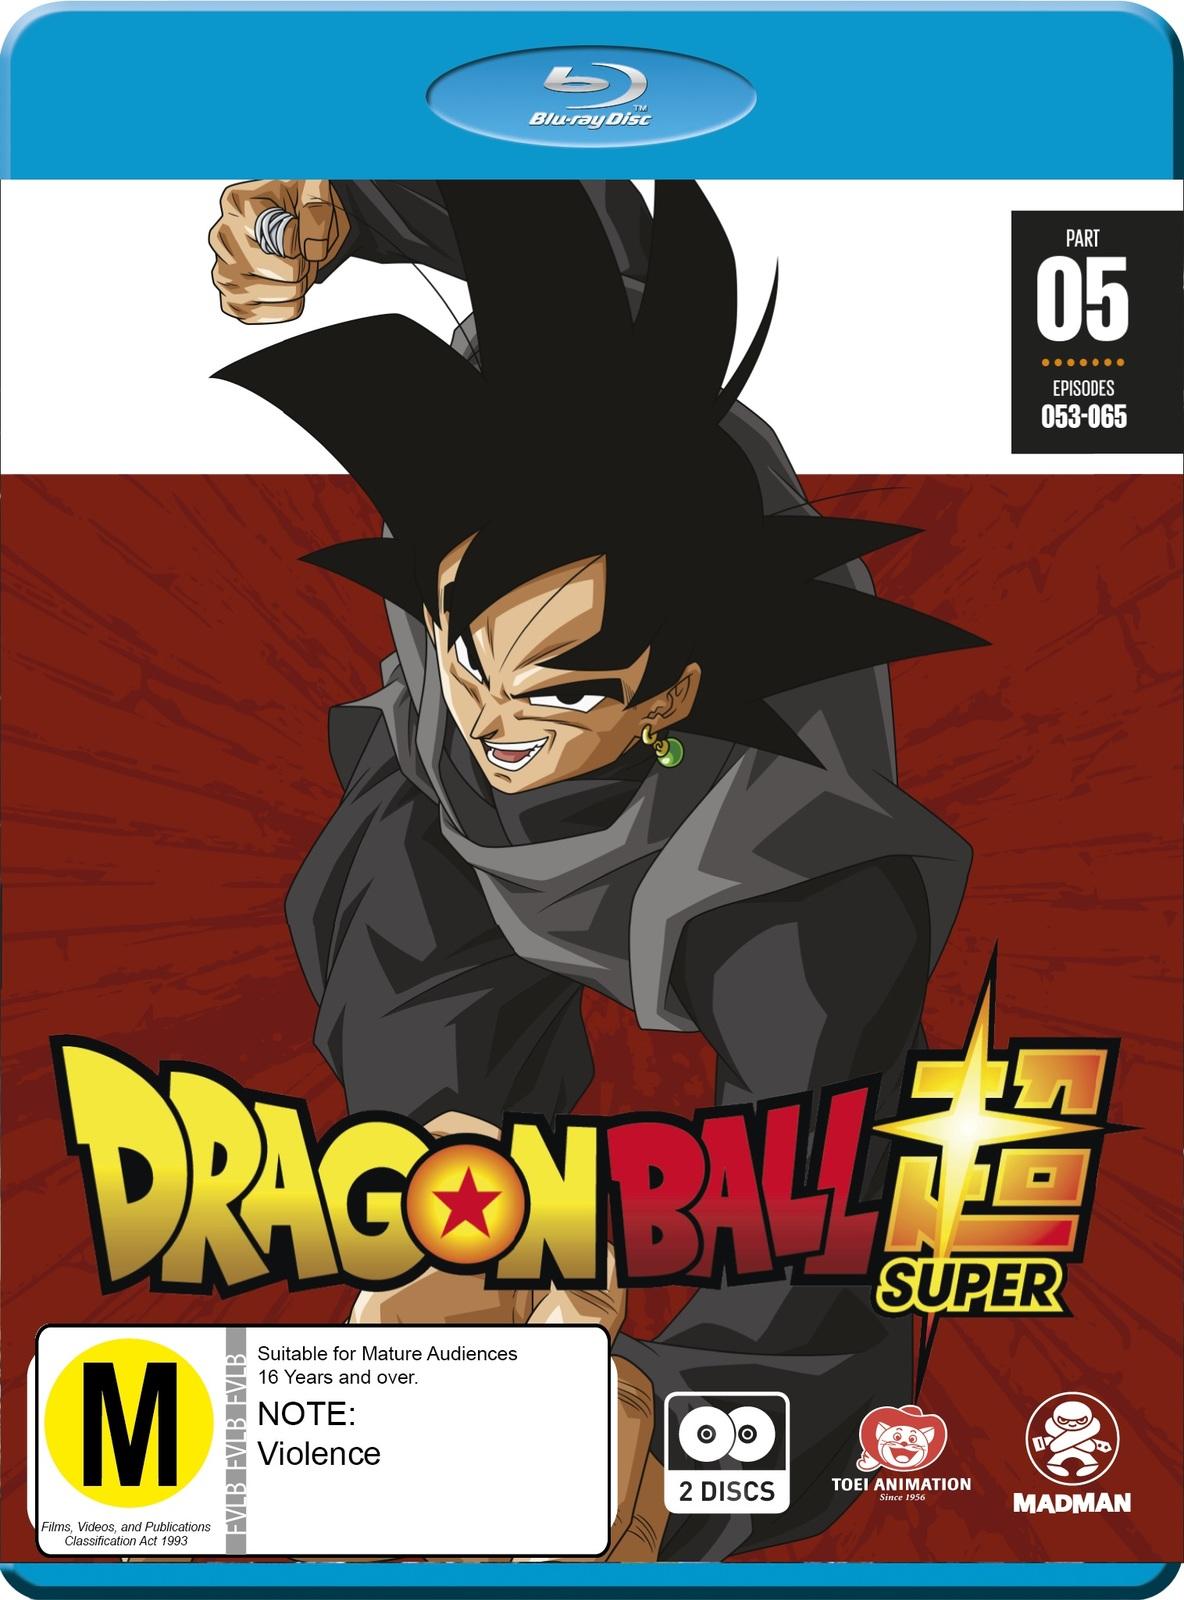 Dragon Ball Super Part 5 (eps 53-65) on Blu-ray image